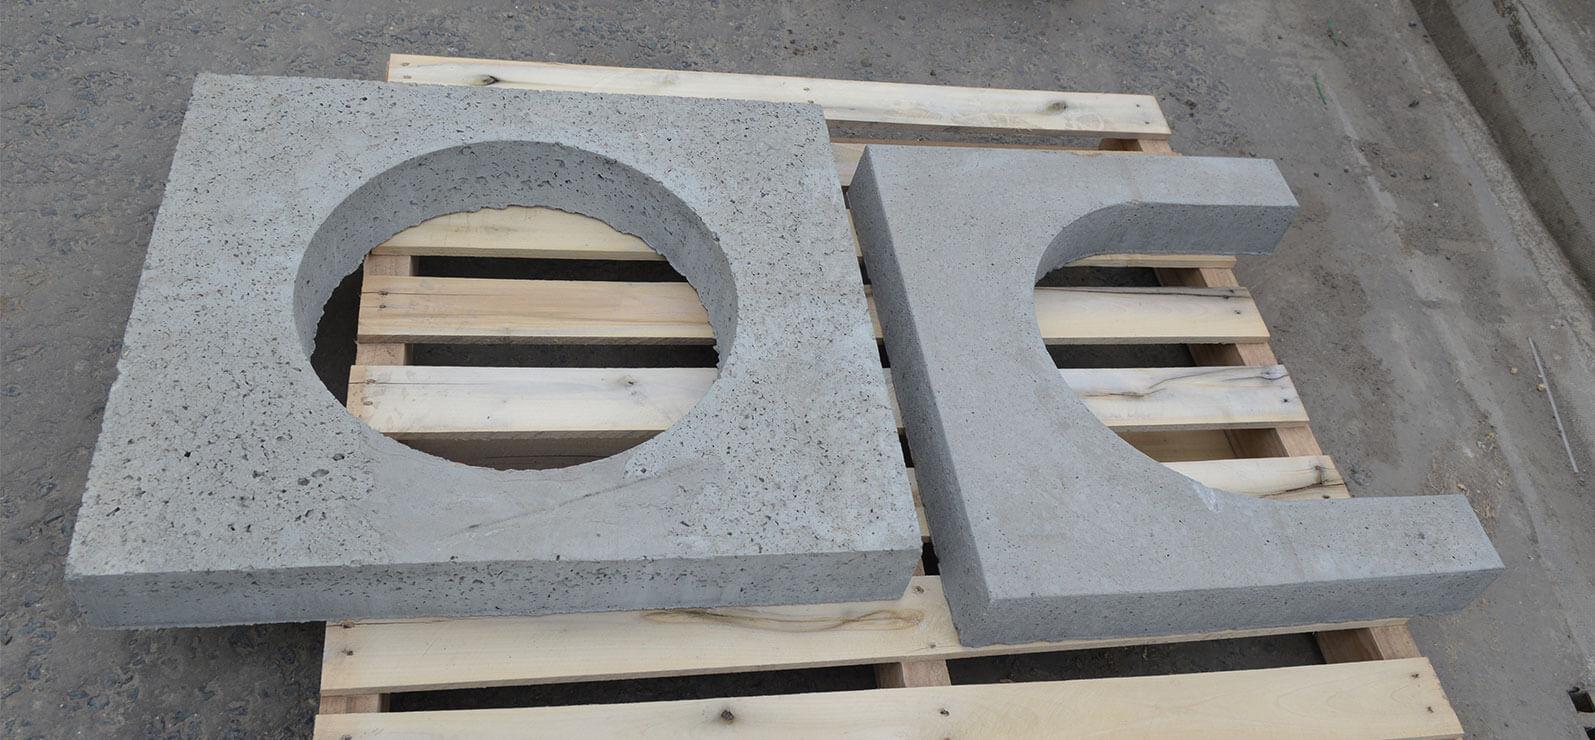 FP-McCann-precast-concrete-drainage-gully-cover-slabs-gallery